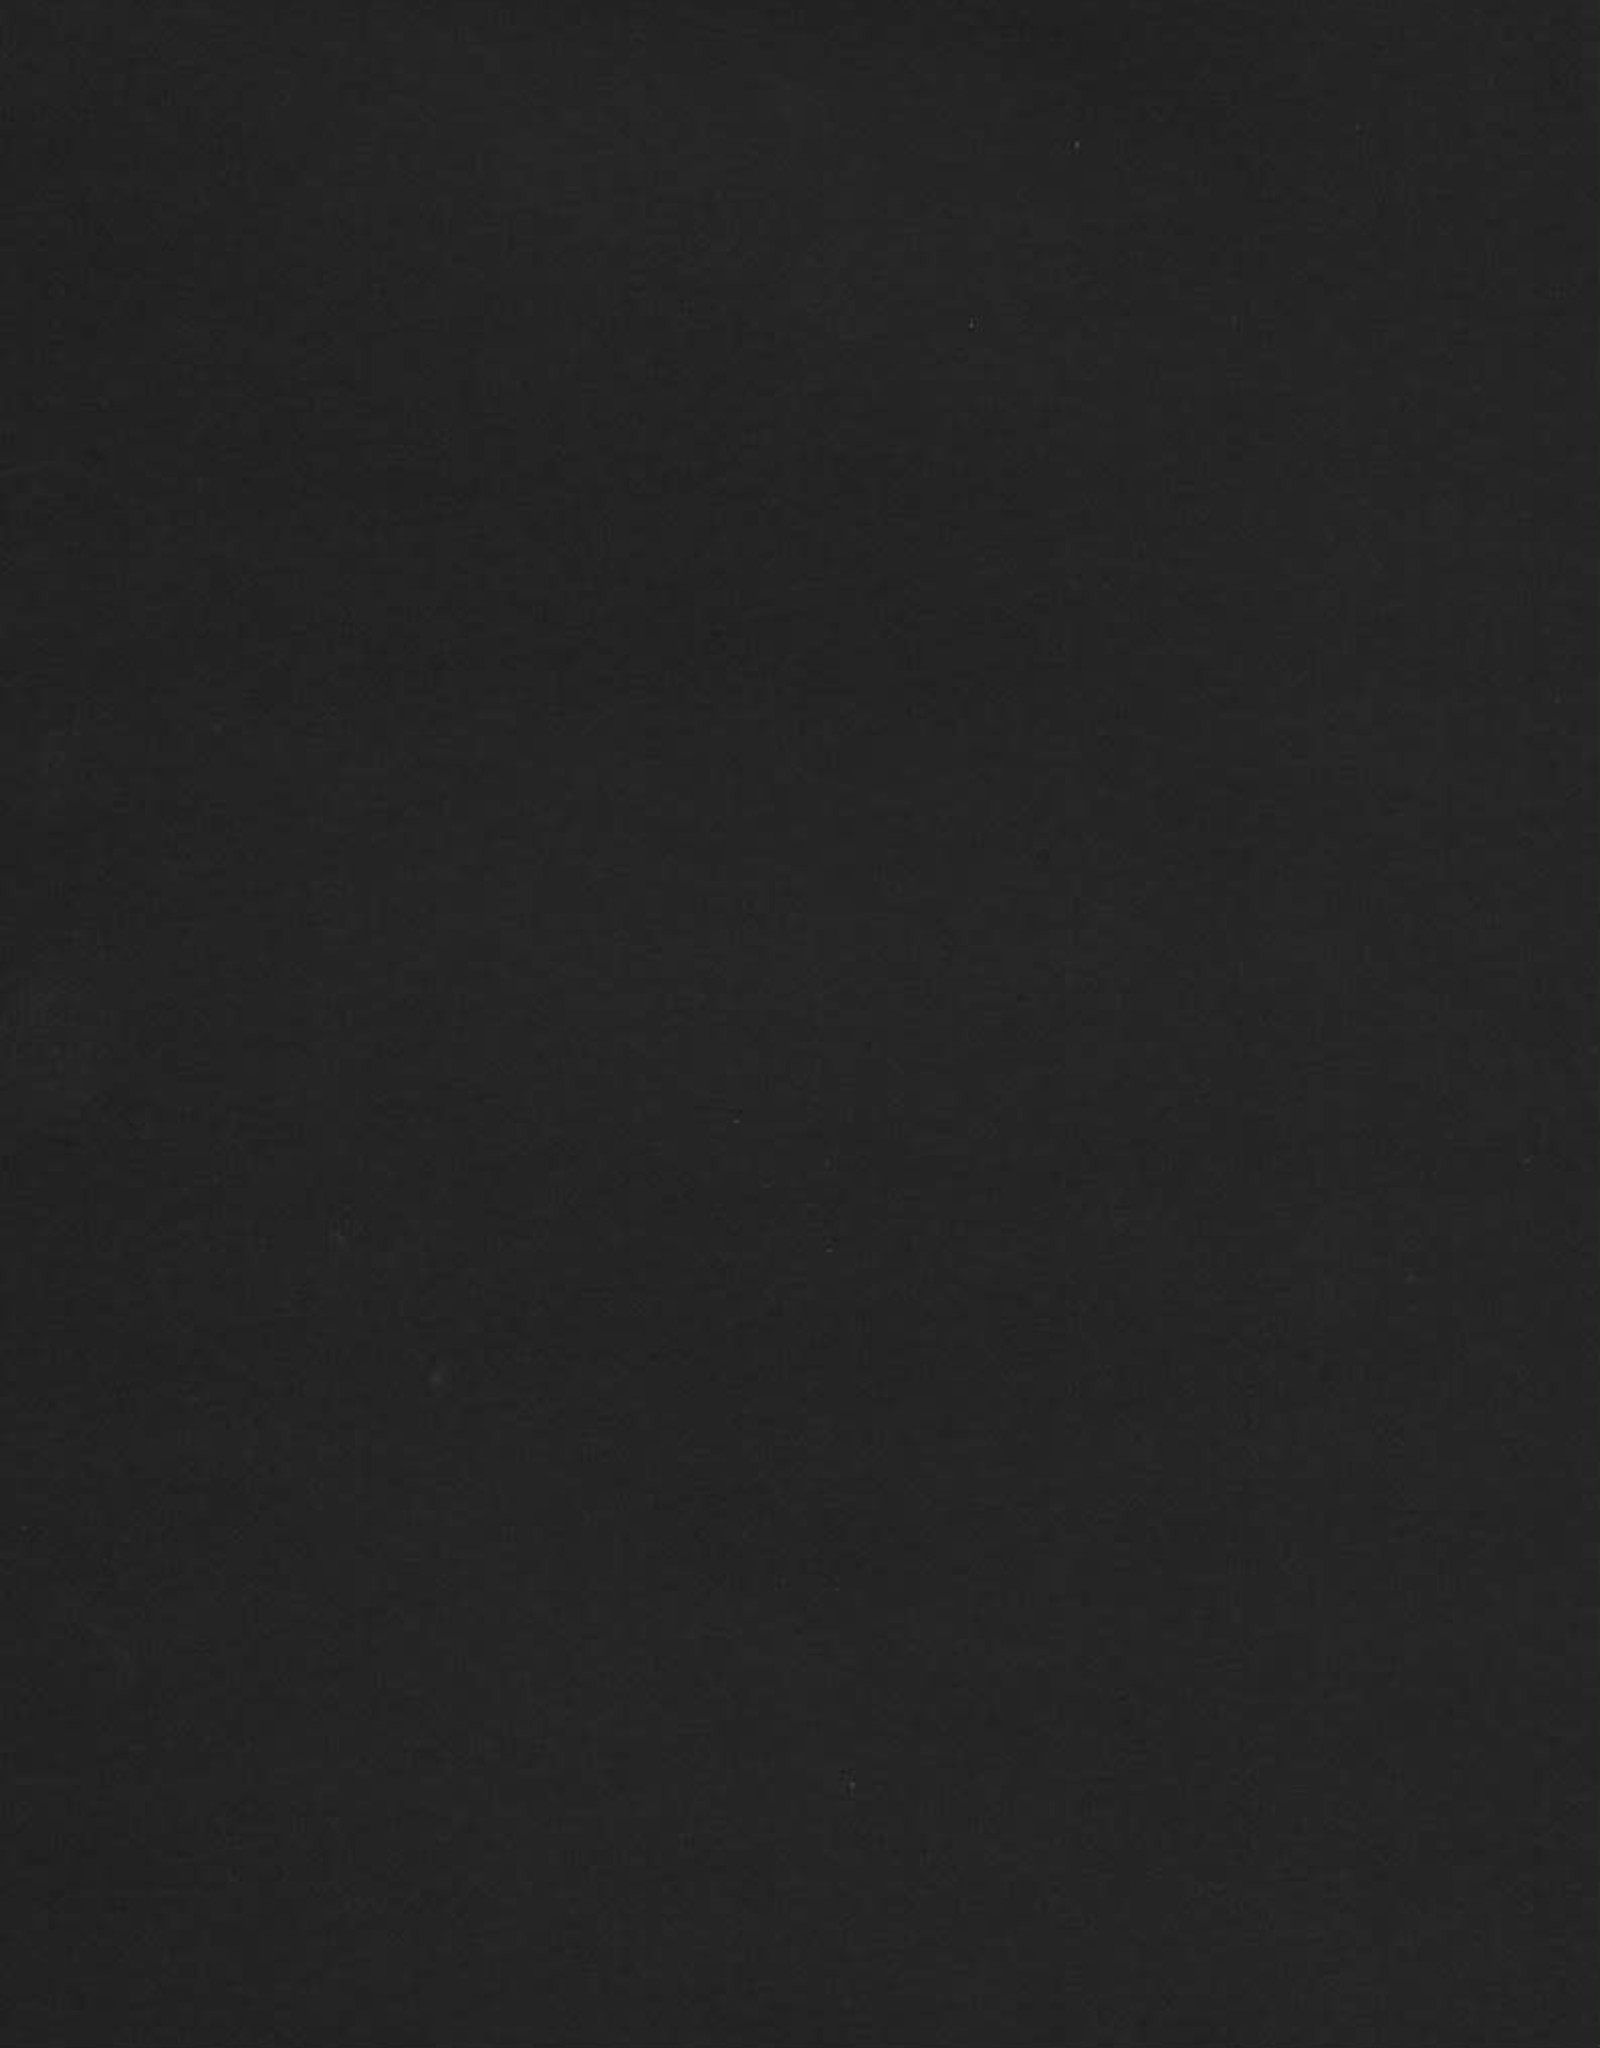 "Fabriano Vice Versa (Elle Erre), Black, 20"" x 27.5"", 220gsm / 135#"